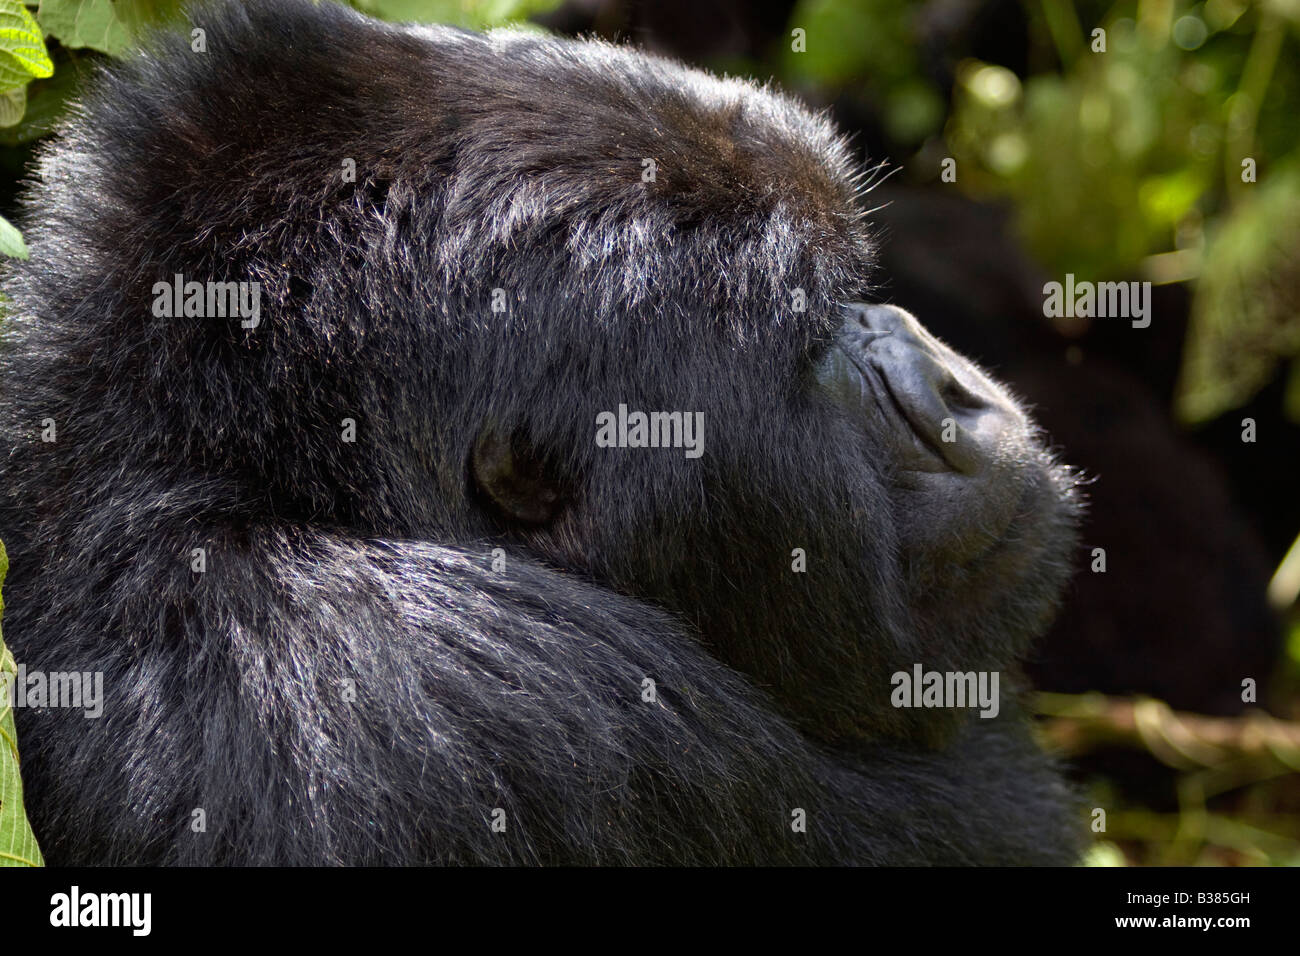 Eine männliche MOUNTAIN GORILLA Gorilla Beringei Beringei der KWITONDA Gruppe in Ruanda VOLCANES Nationalpark Stockbild